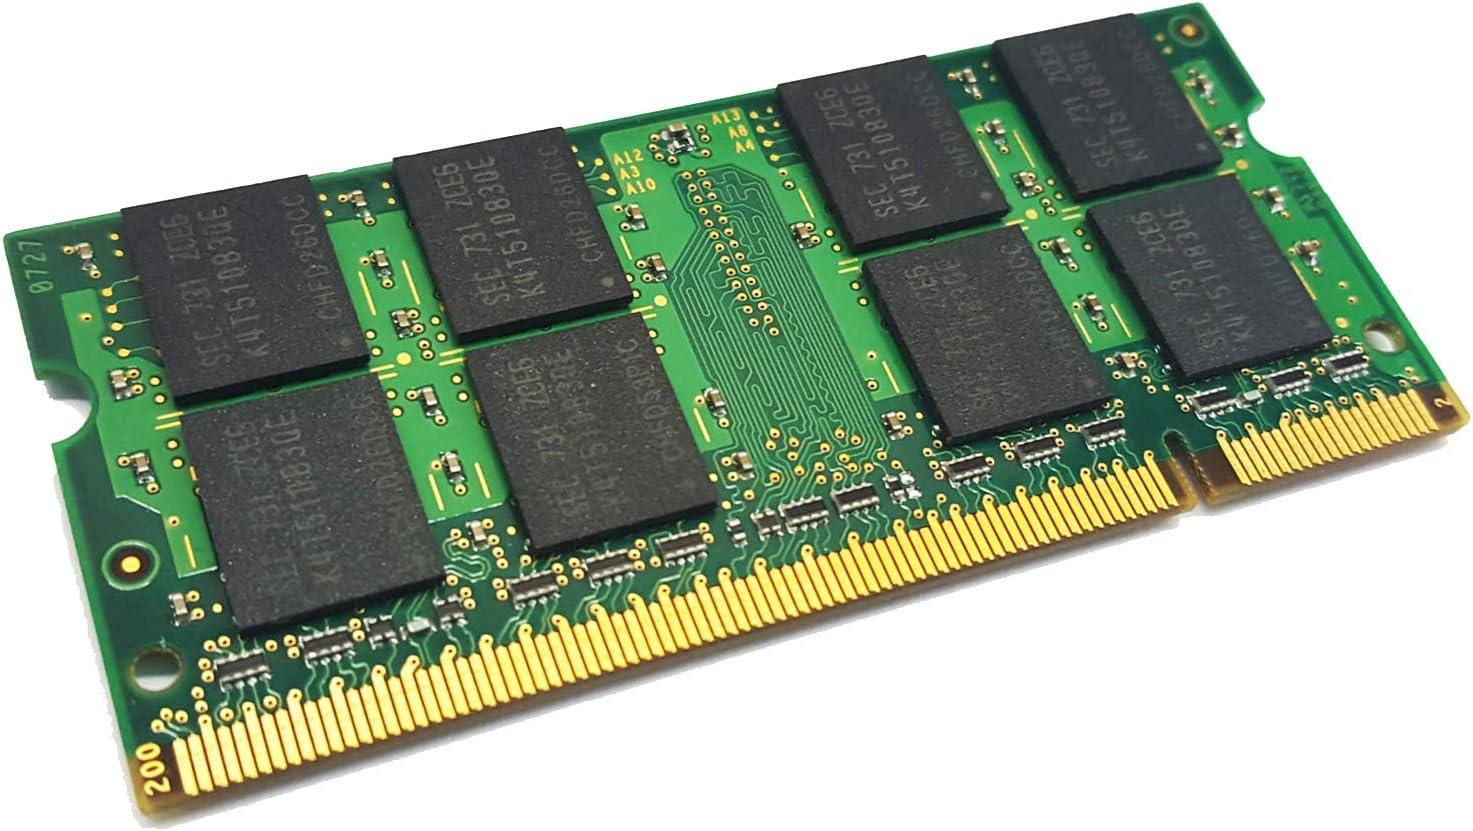 dekoelektropunktde Compatible con Acer Aspire One D250 D150 | 2GB Ram Memoria SODIMM DDR2 PC2 para